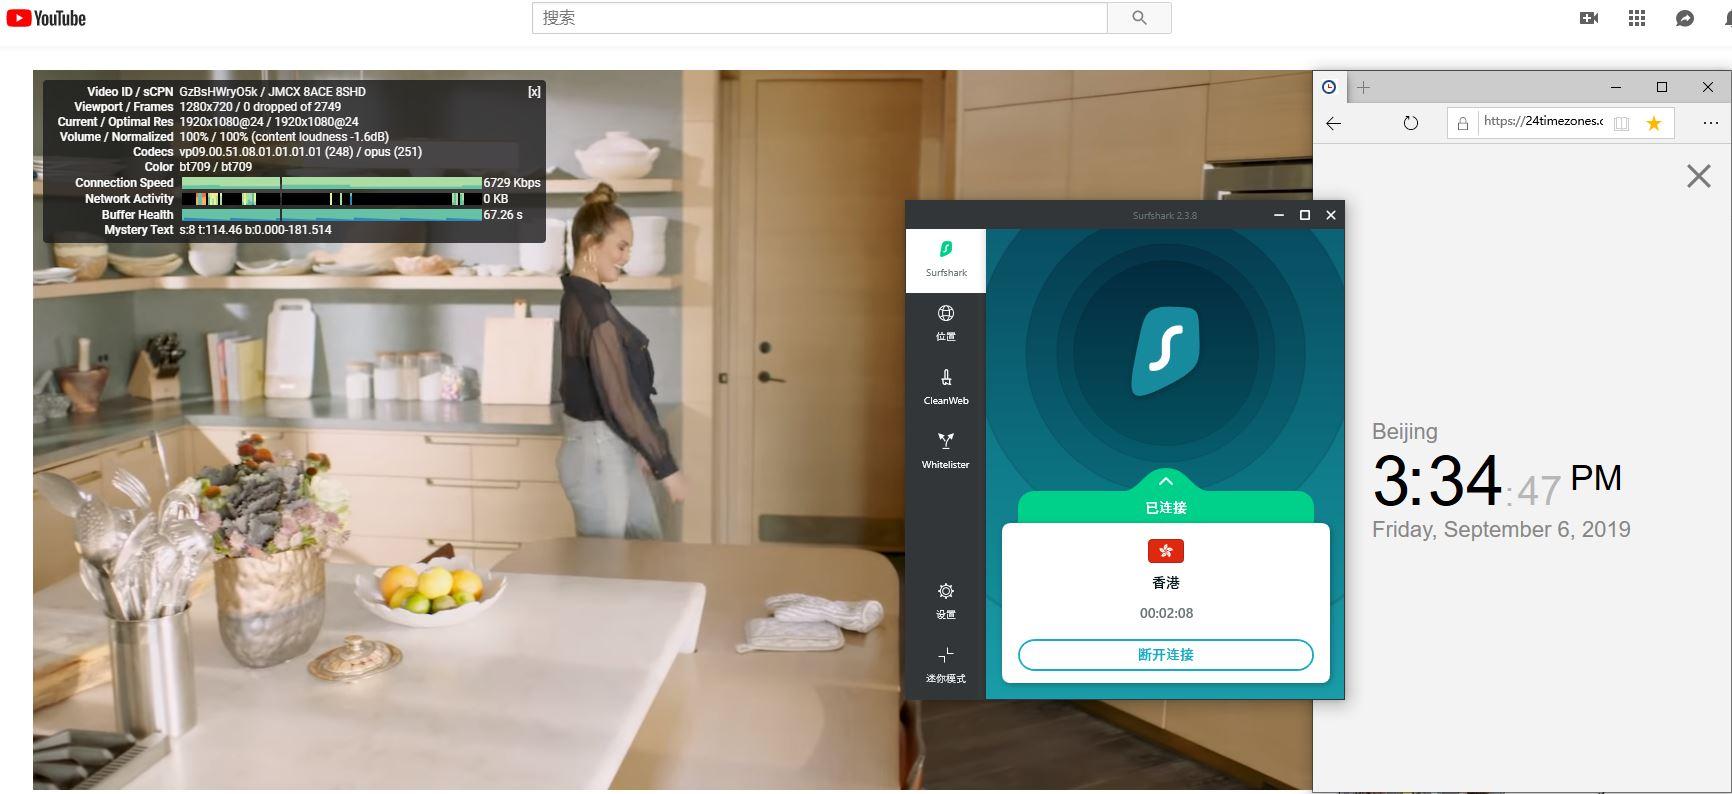 windows surfsharkvpn hongkong服务器 中国vpn翻墙 科学上网 YouTube速度测试-20190906